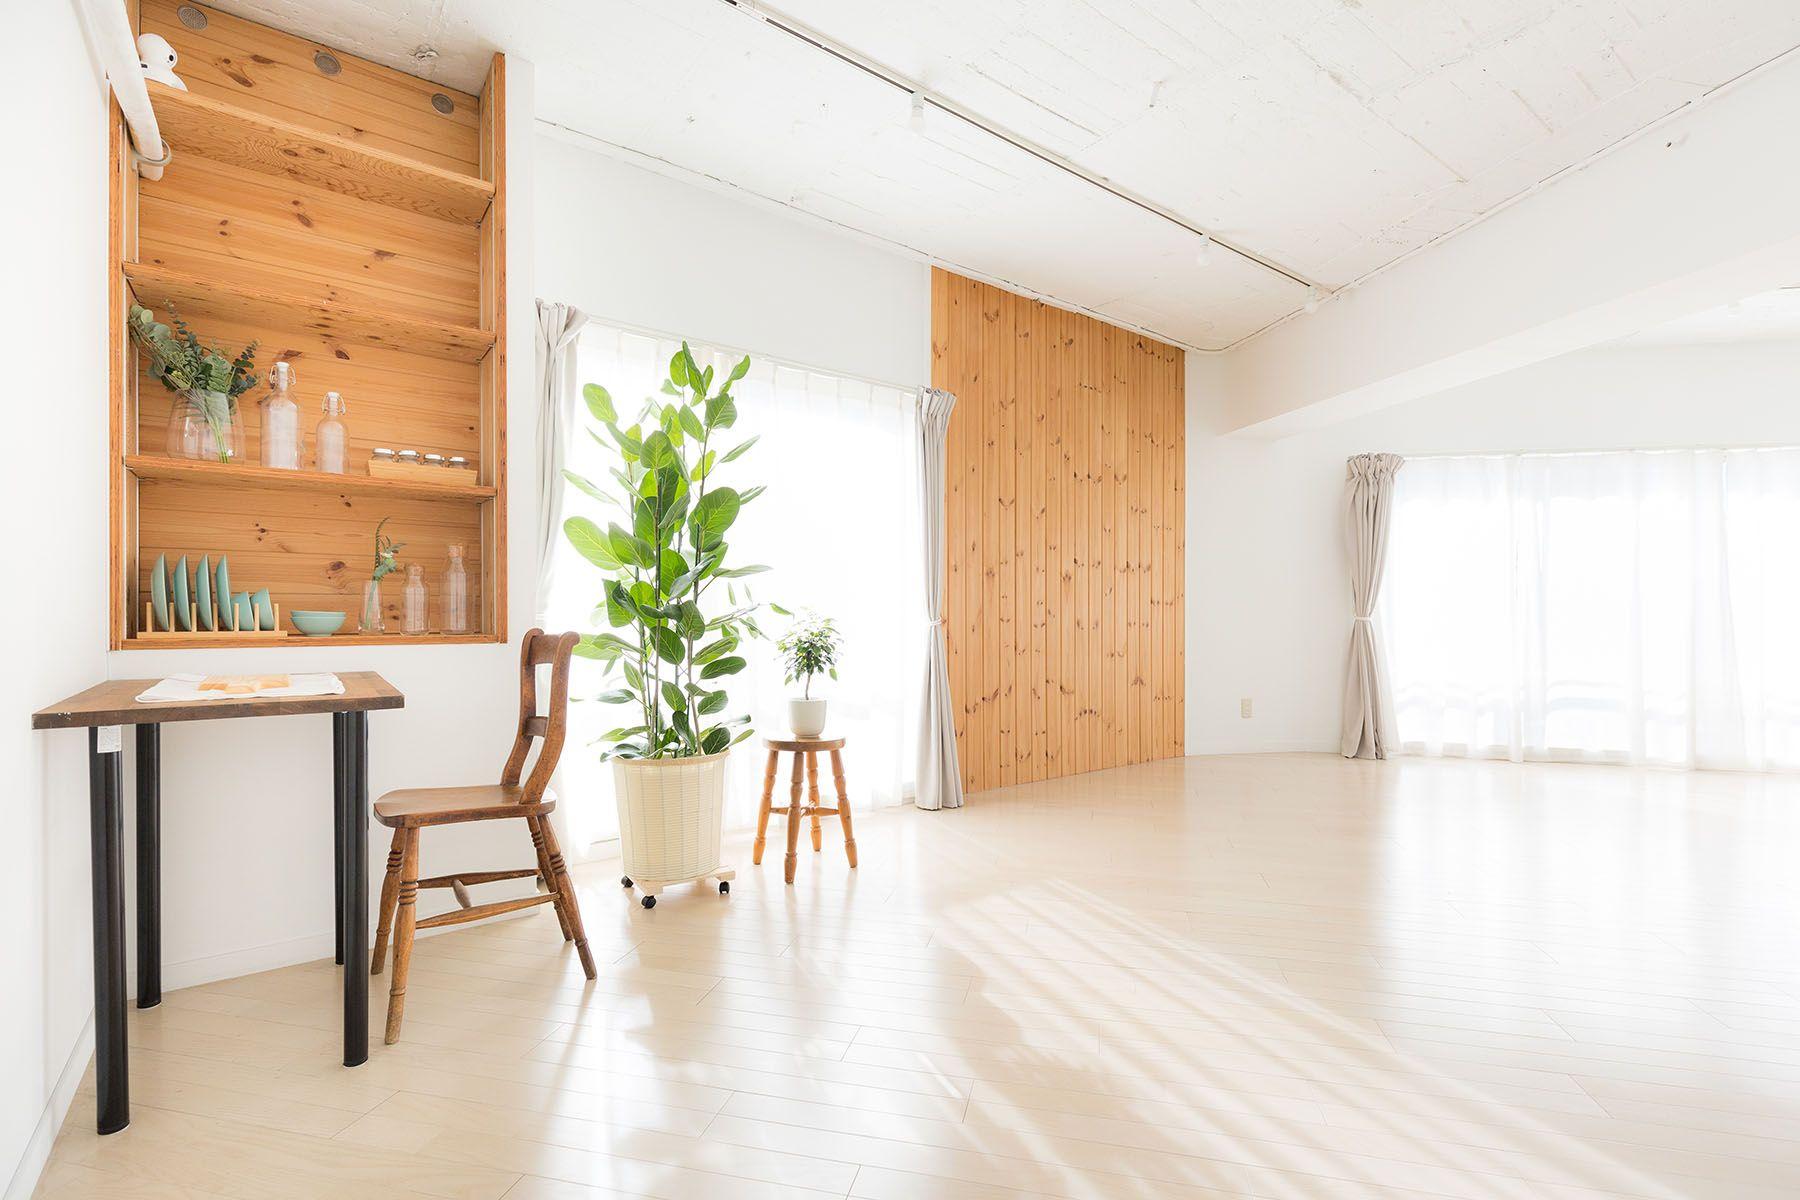 Studio Serato 代々木 (スタジオセラート代々木)系列店より3台追加可能、計5台に